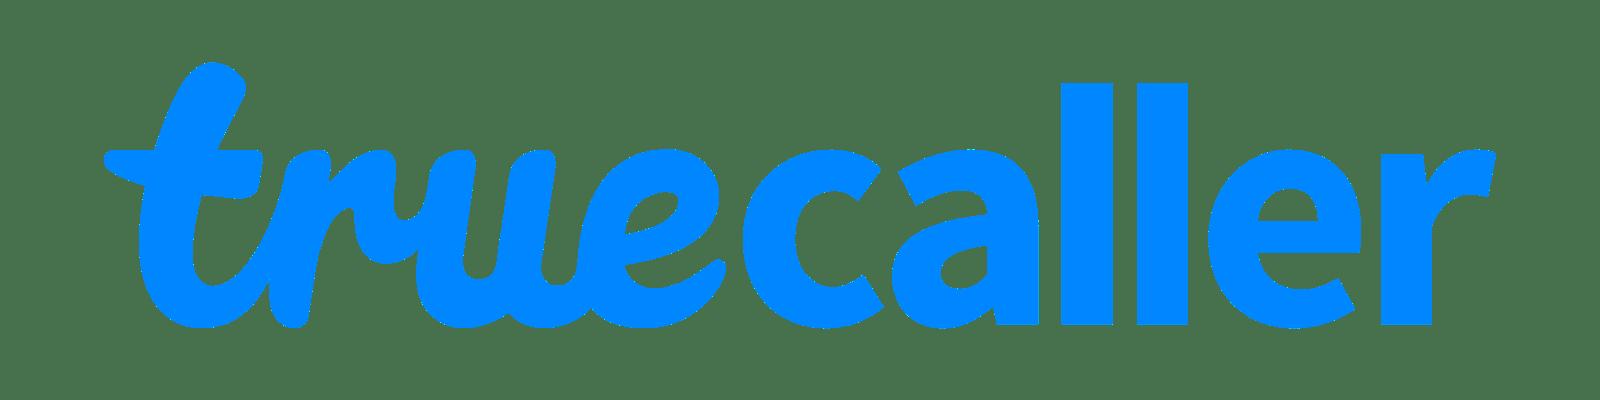 Truecaller company logo